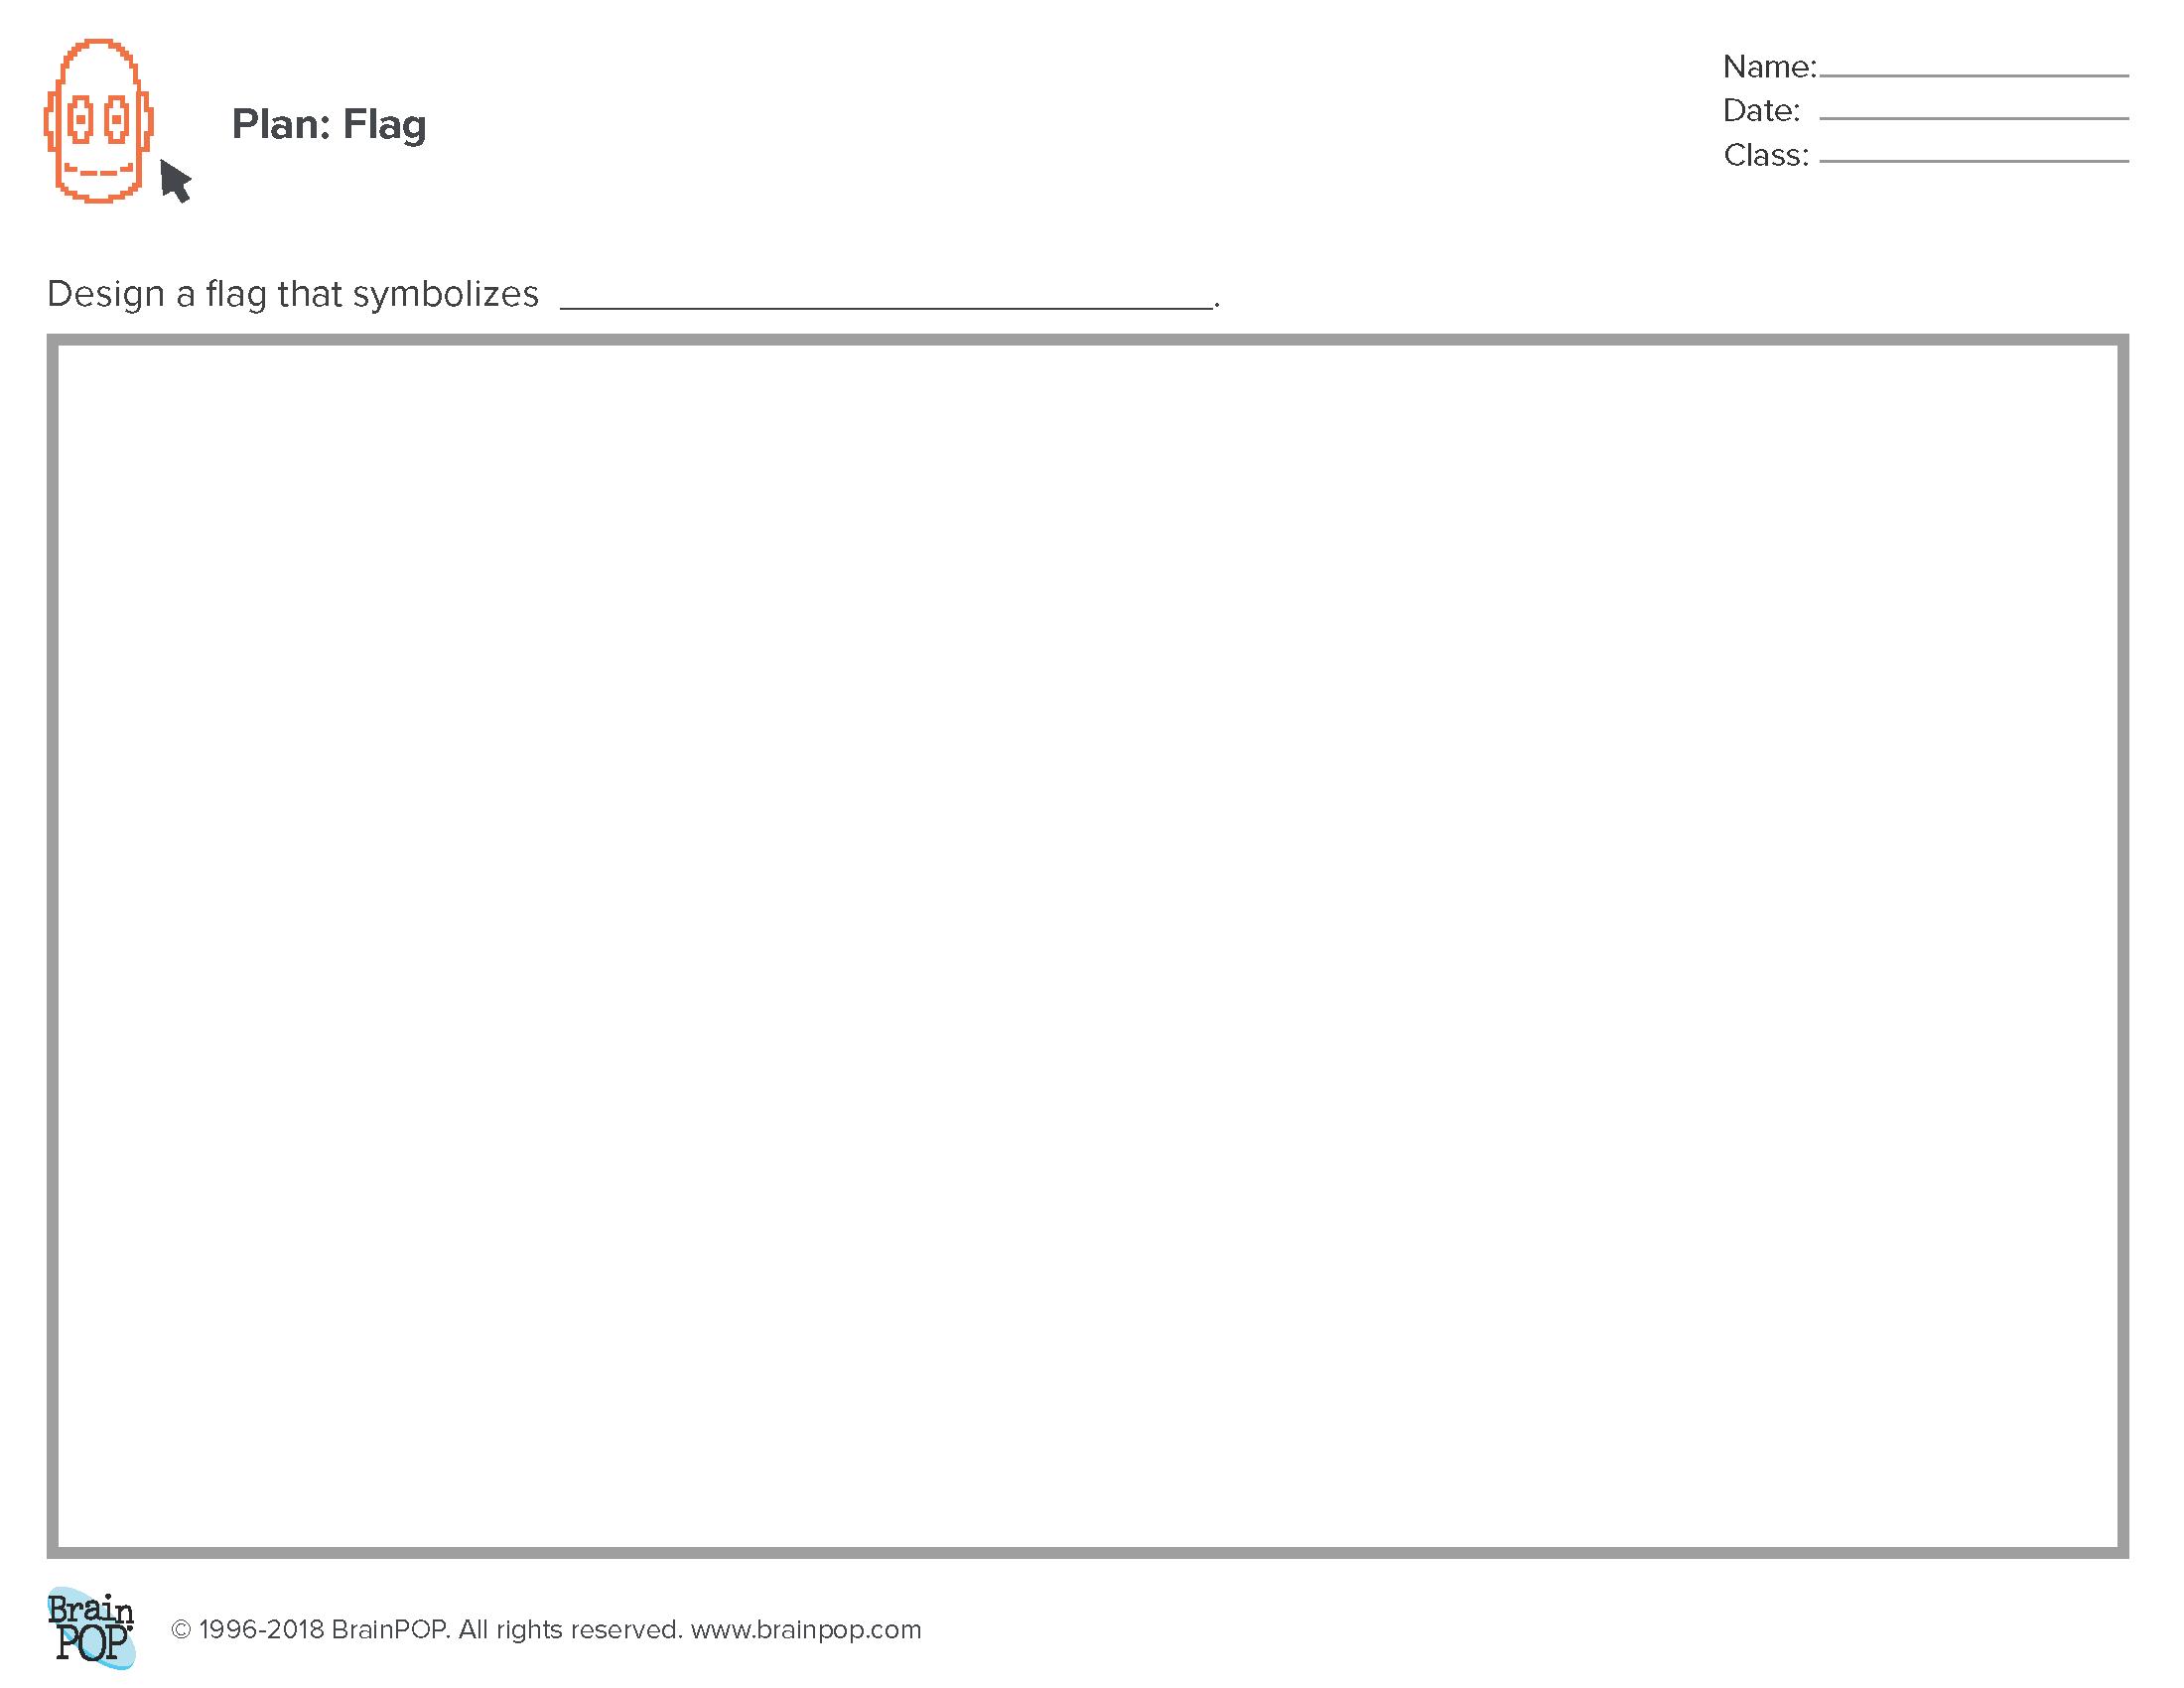 Planning Sheet: Flag